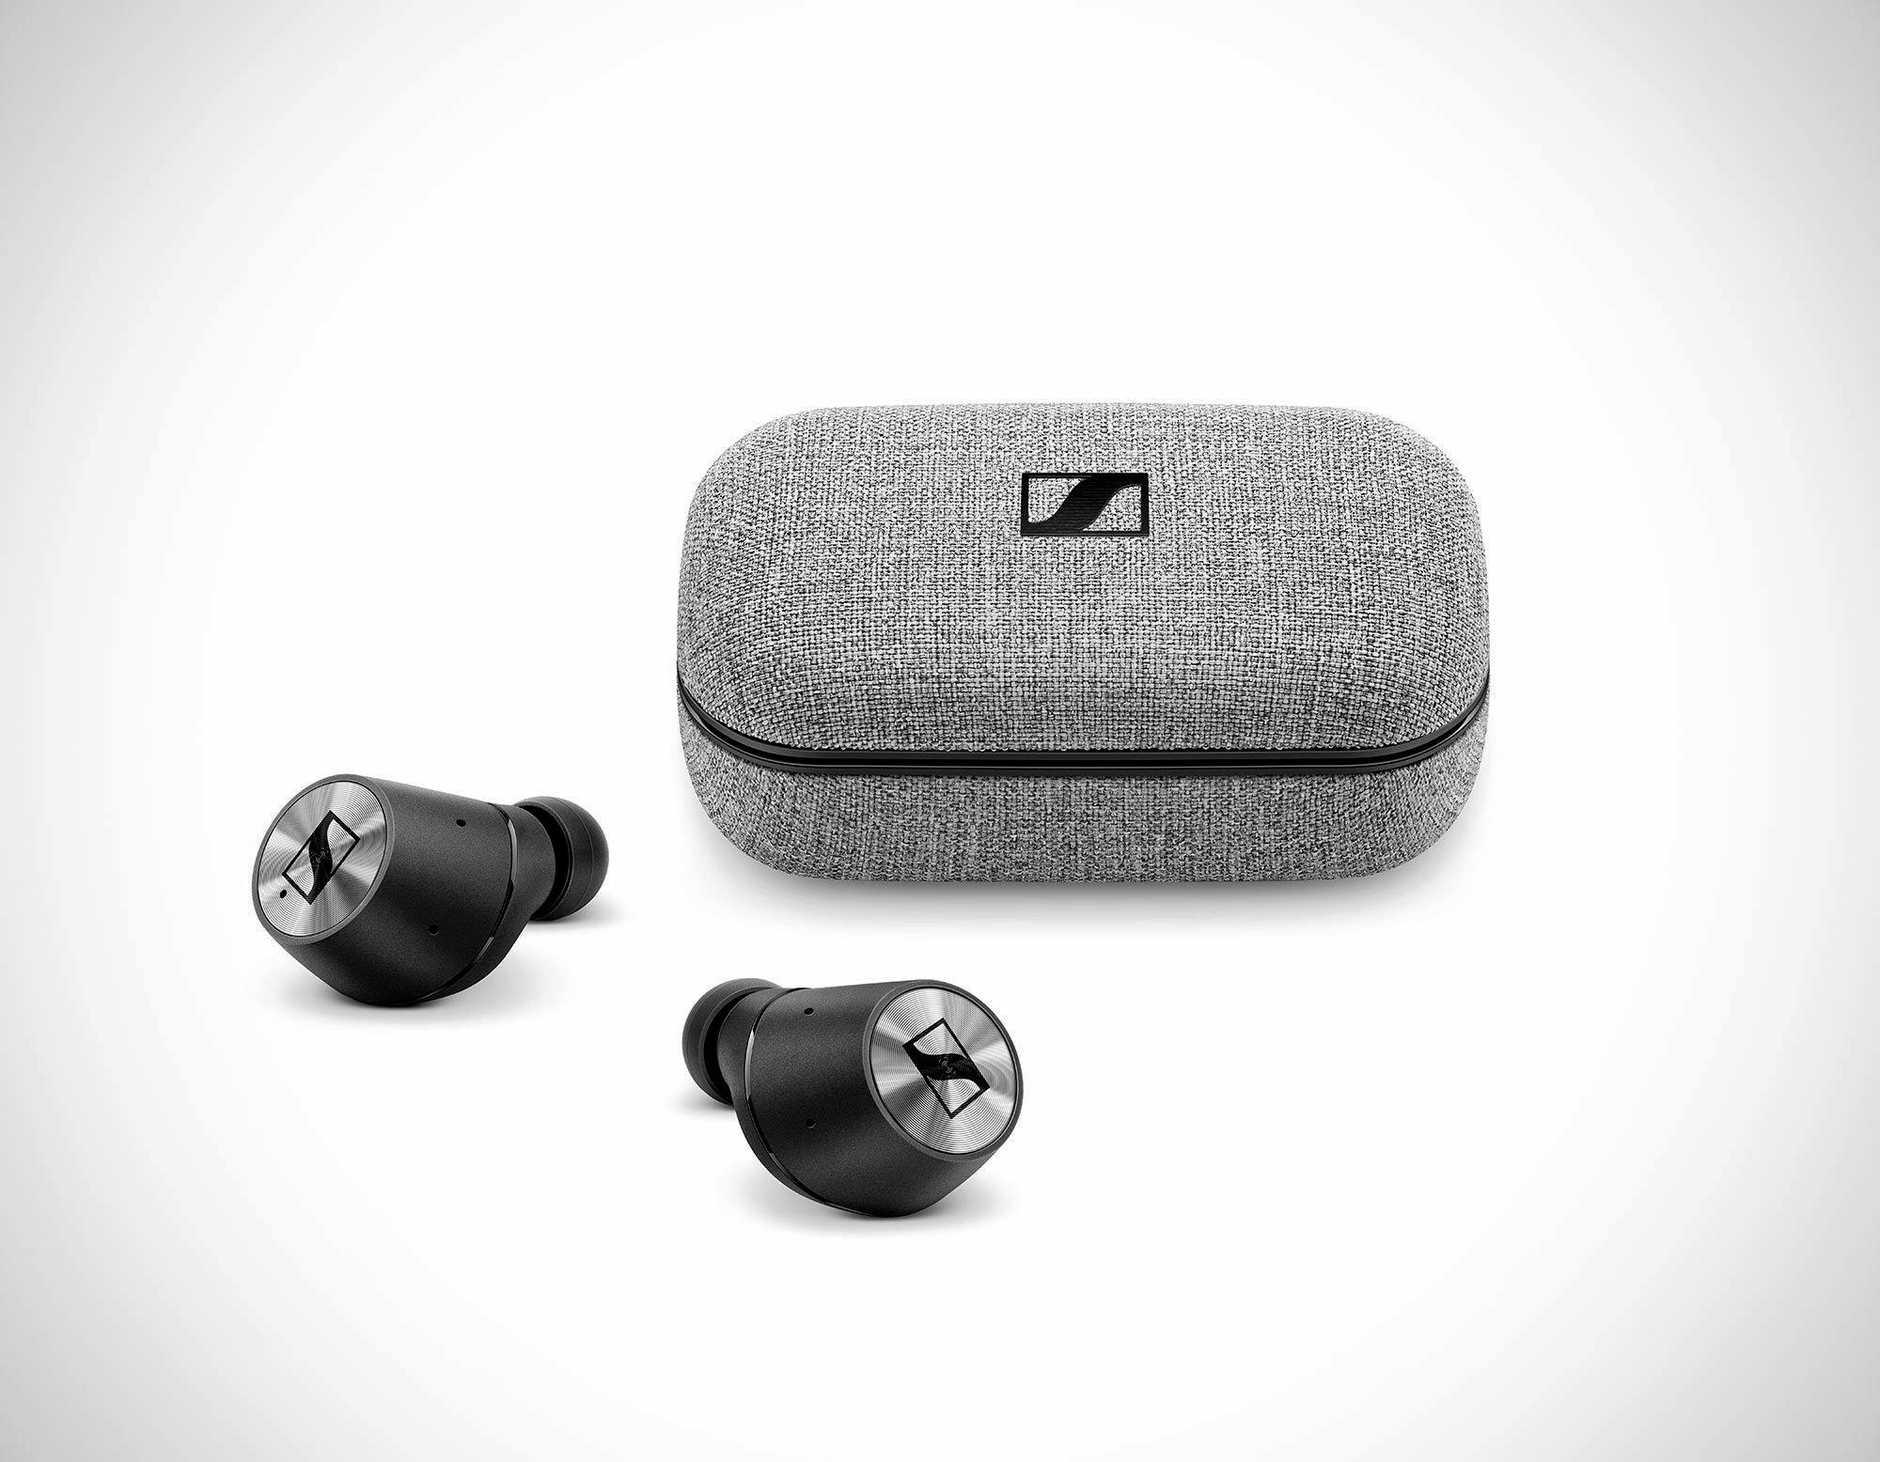 EXCEPTIONAL: Sennheiser's Momentum True Wireless earphones.